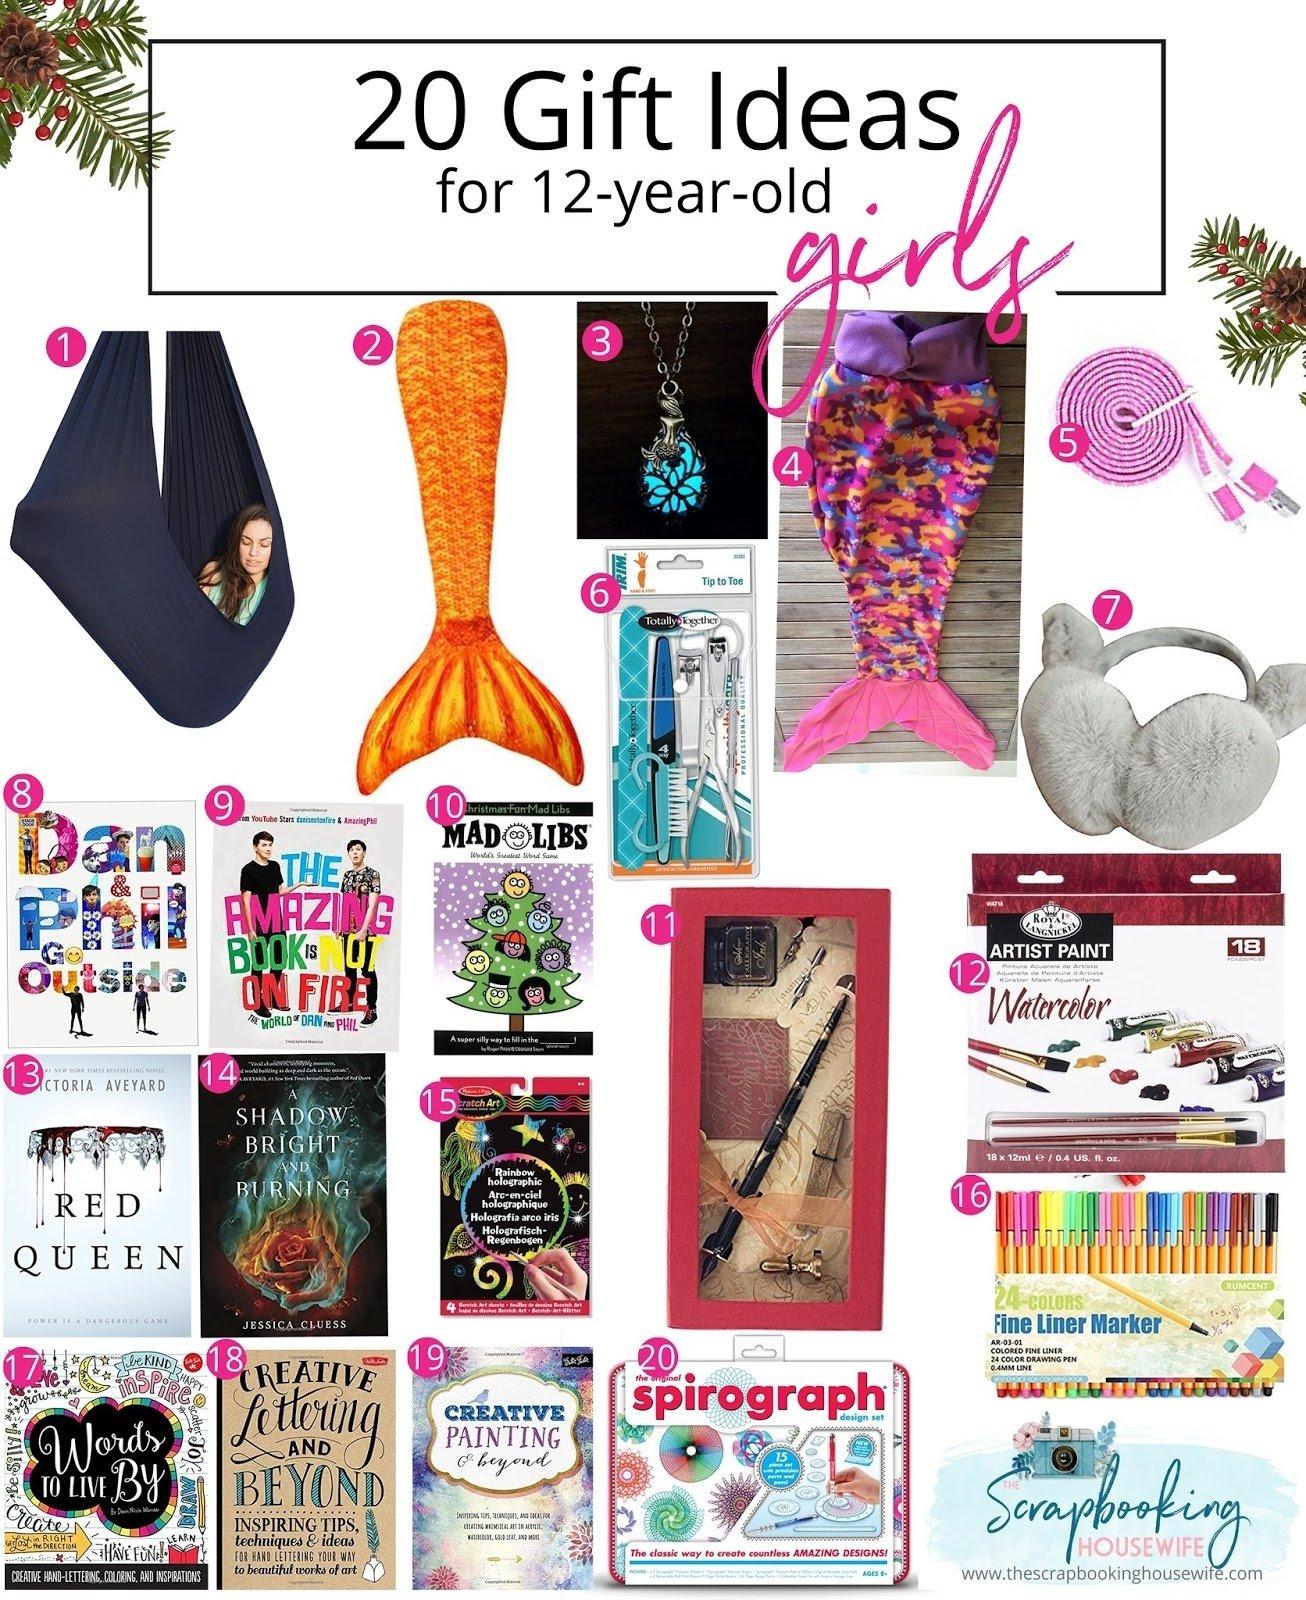 10 Stunning 12 Year Old Girl Gift Ideas ellabella designs 20 gift ideas for 12 year old tween girls 15 2021